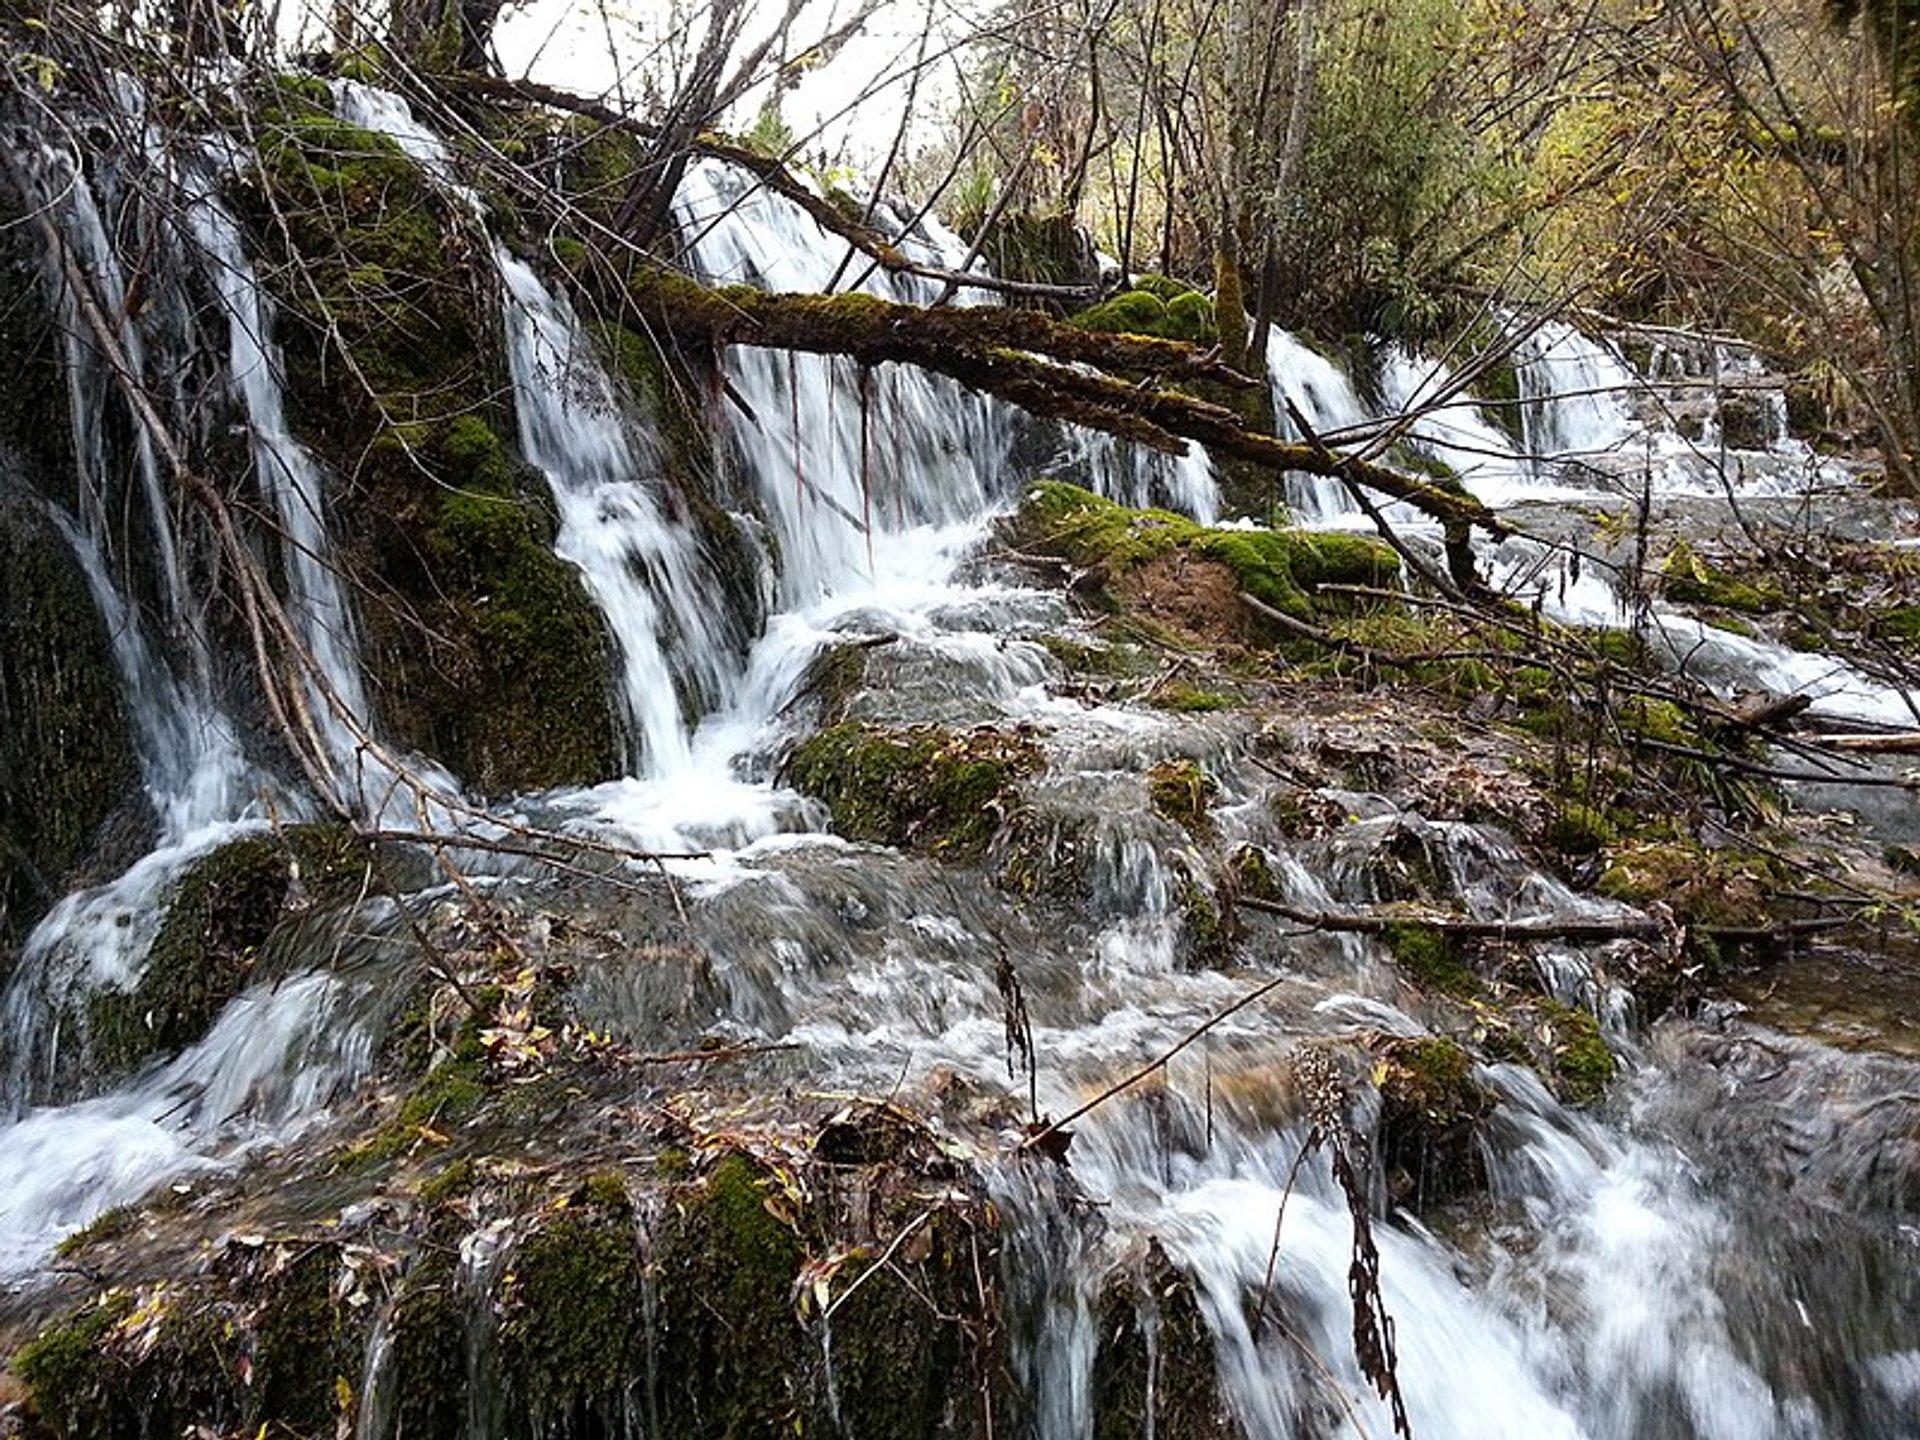 Jianzhu sea waterfalls 2020